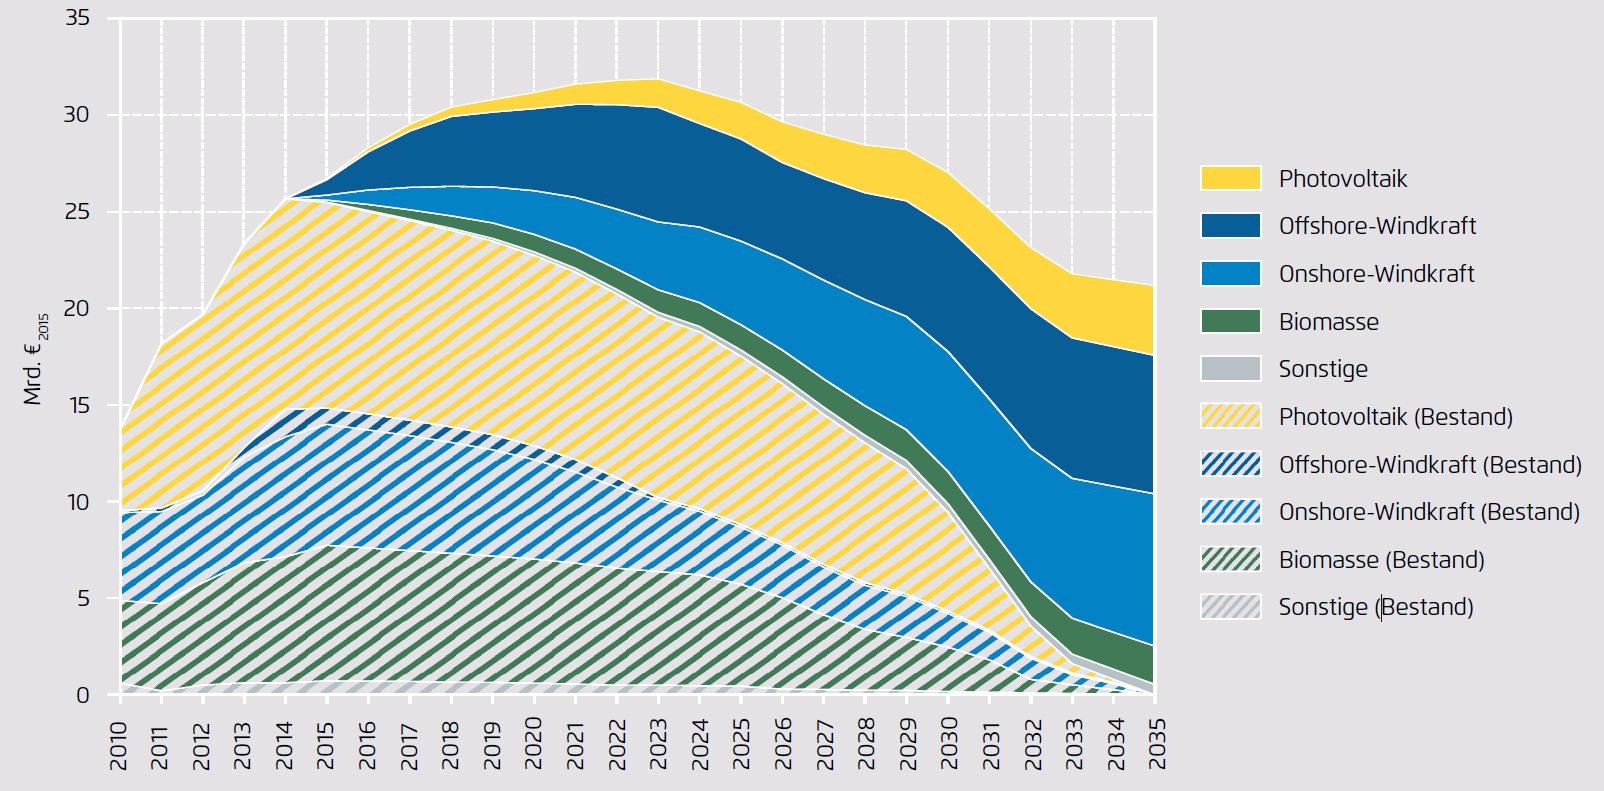 German Feed-In Tariff (EEG) cost by technology type